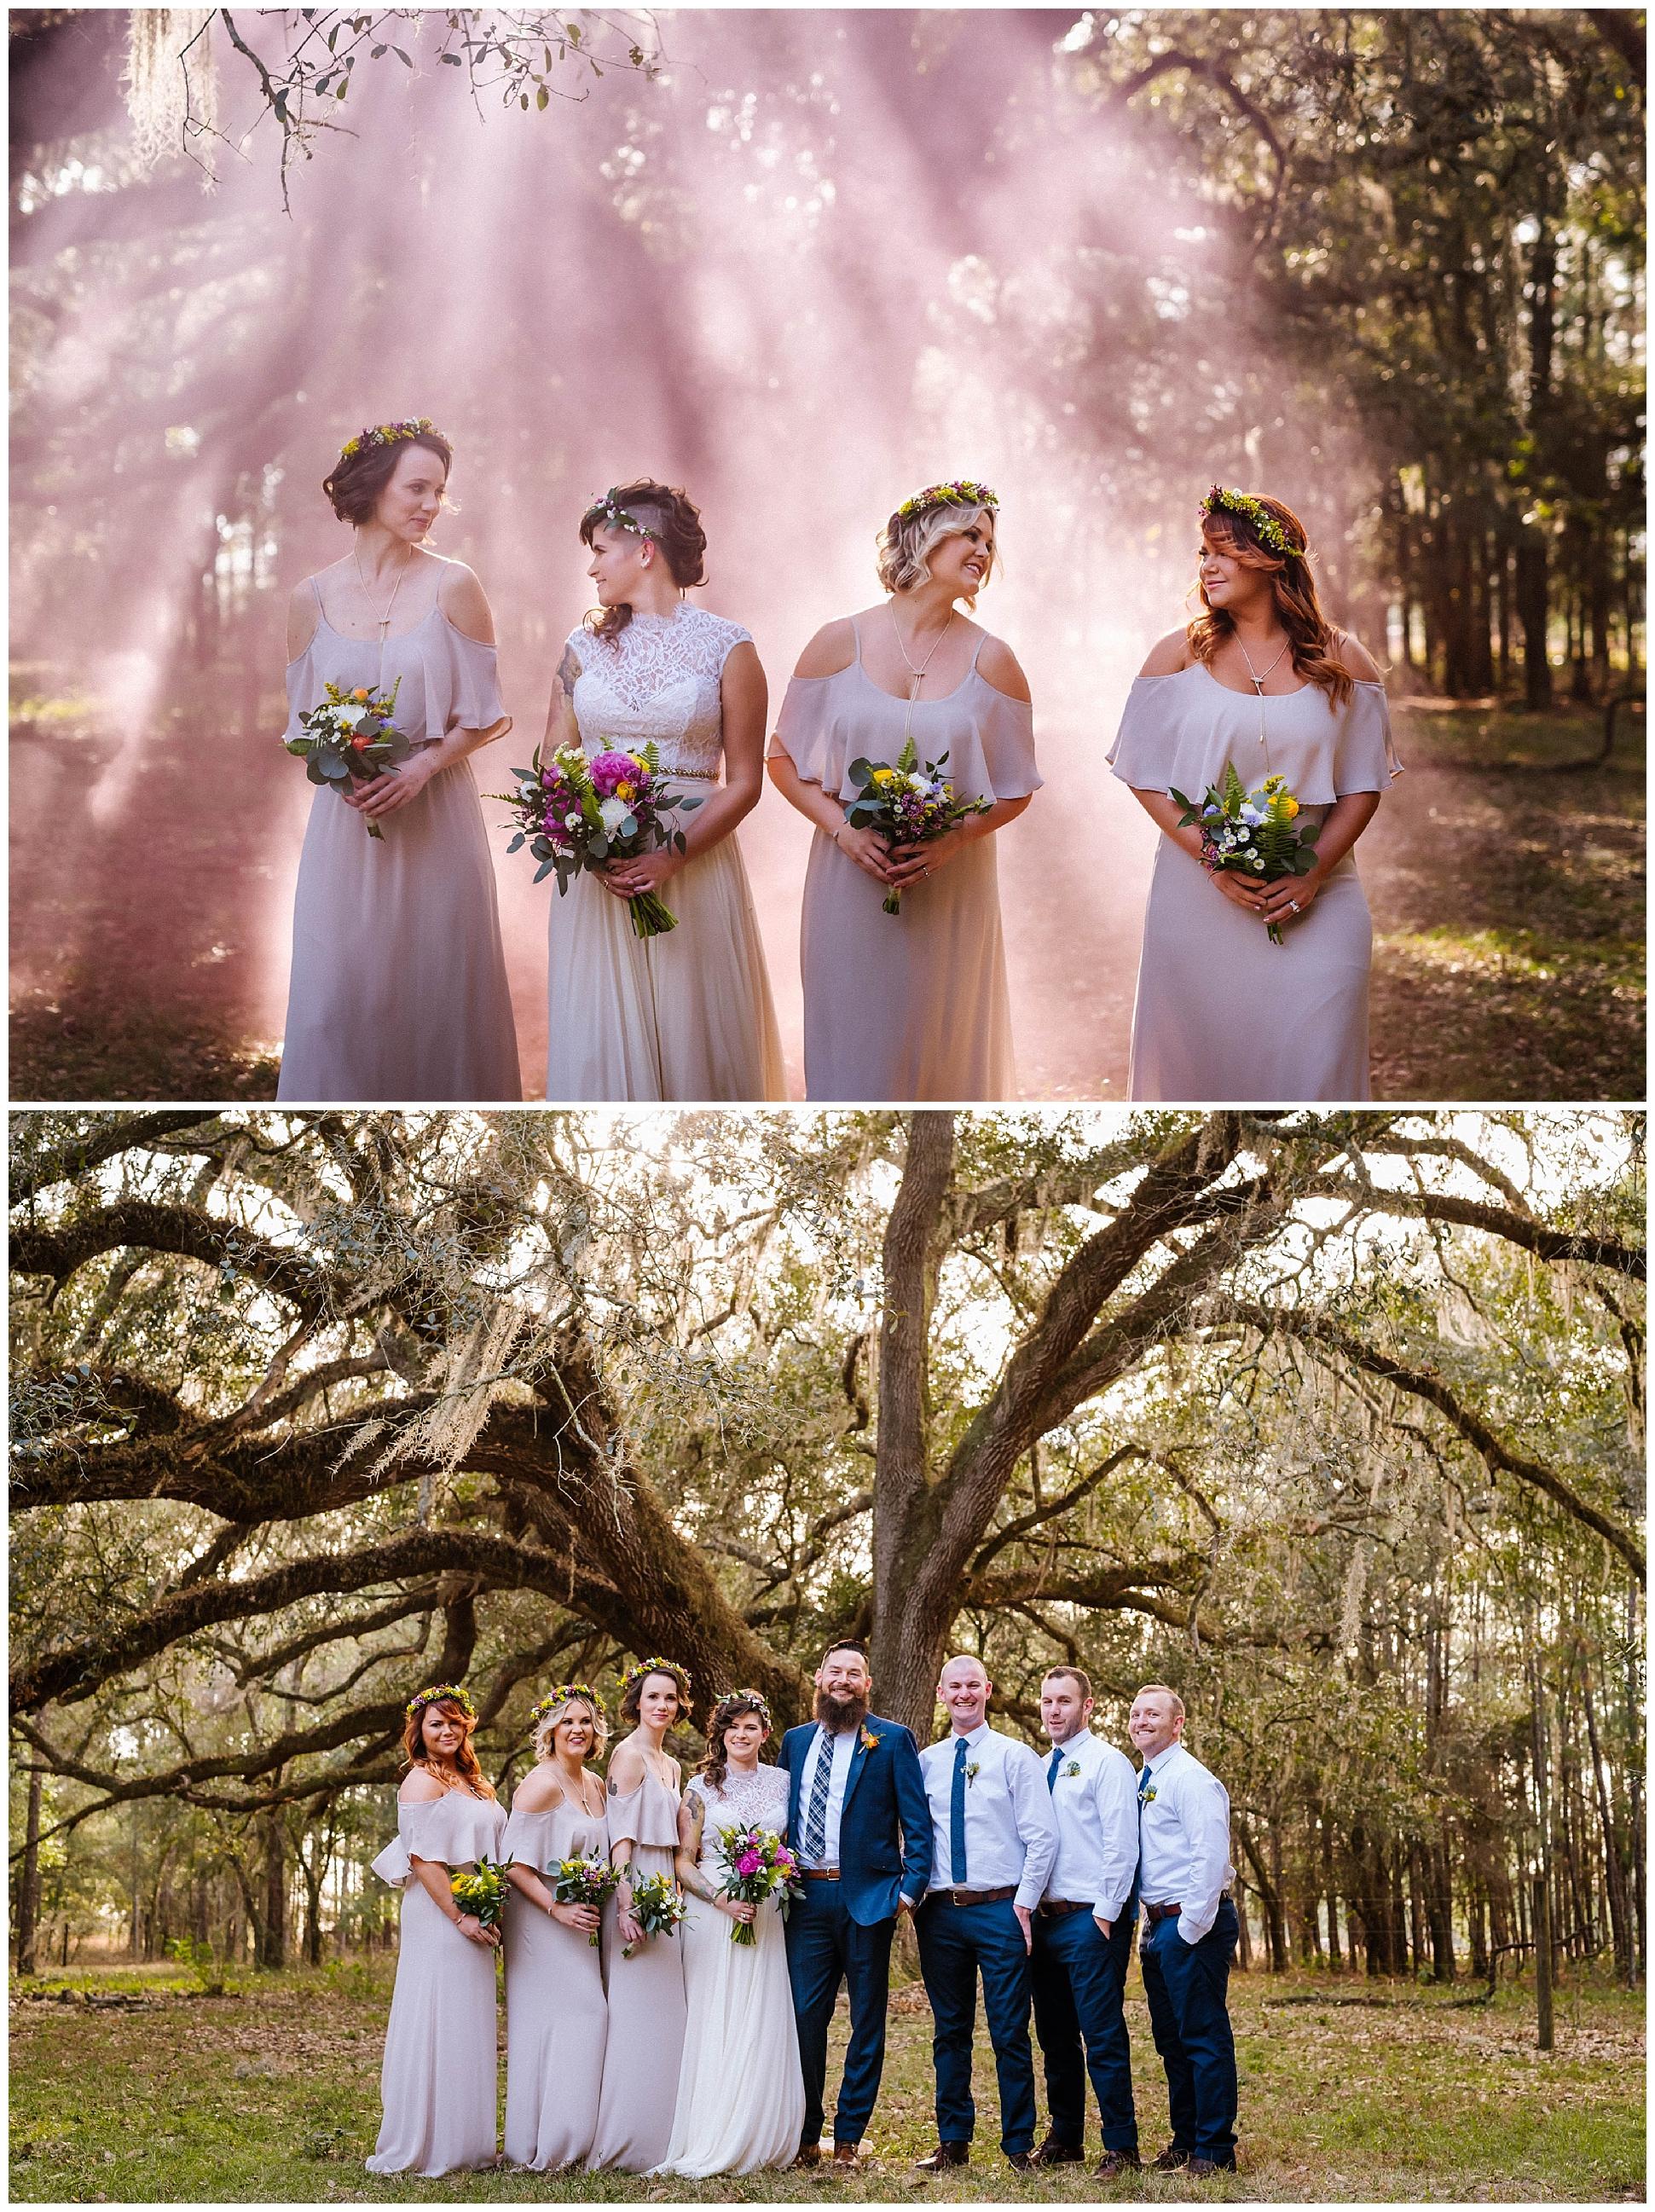 magical-outdoor-florida-wedding-smoke-bombs-flowers-crown-beard_0024.jpg